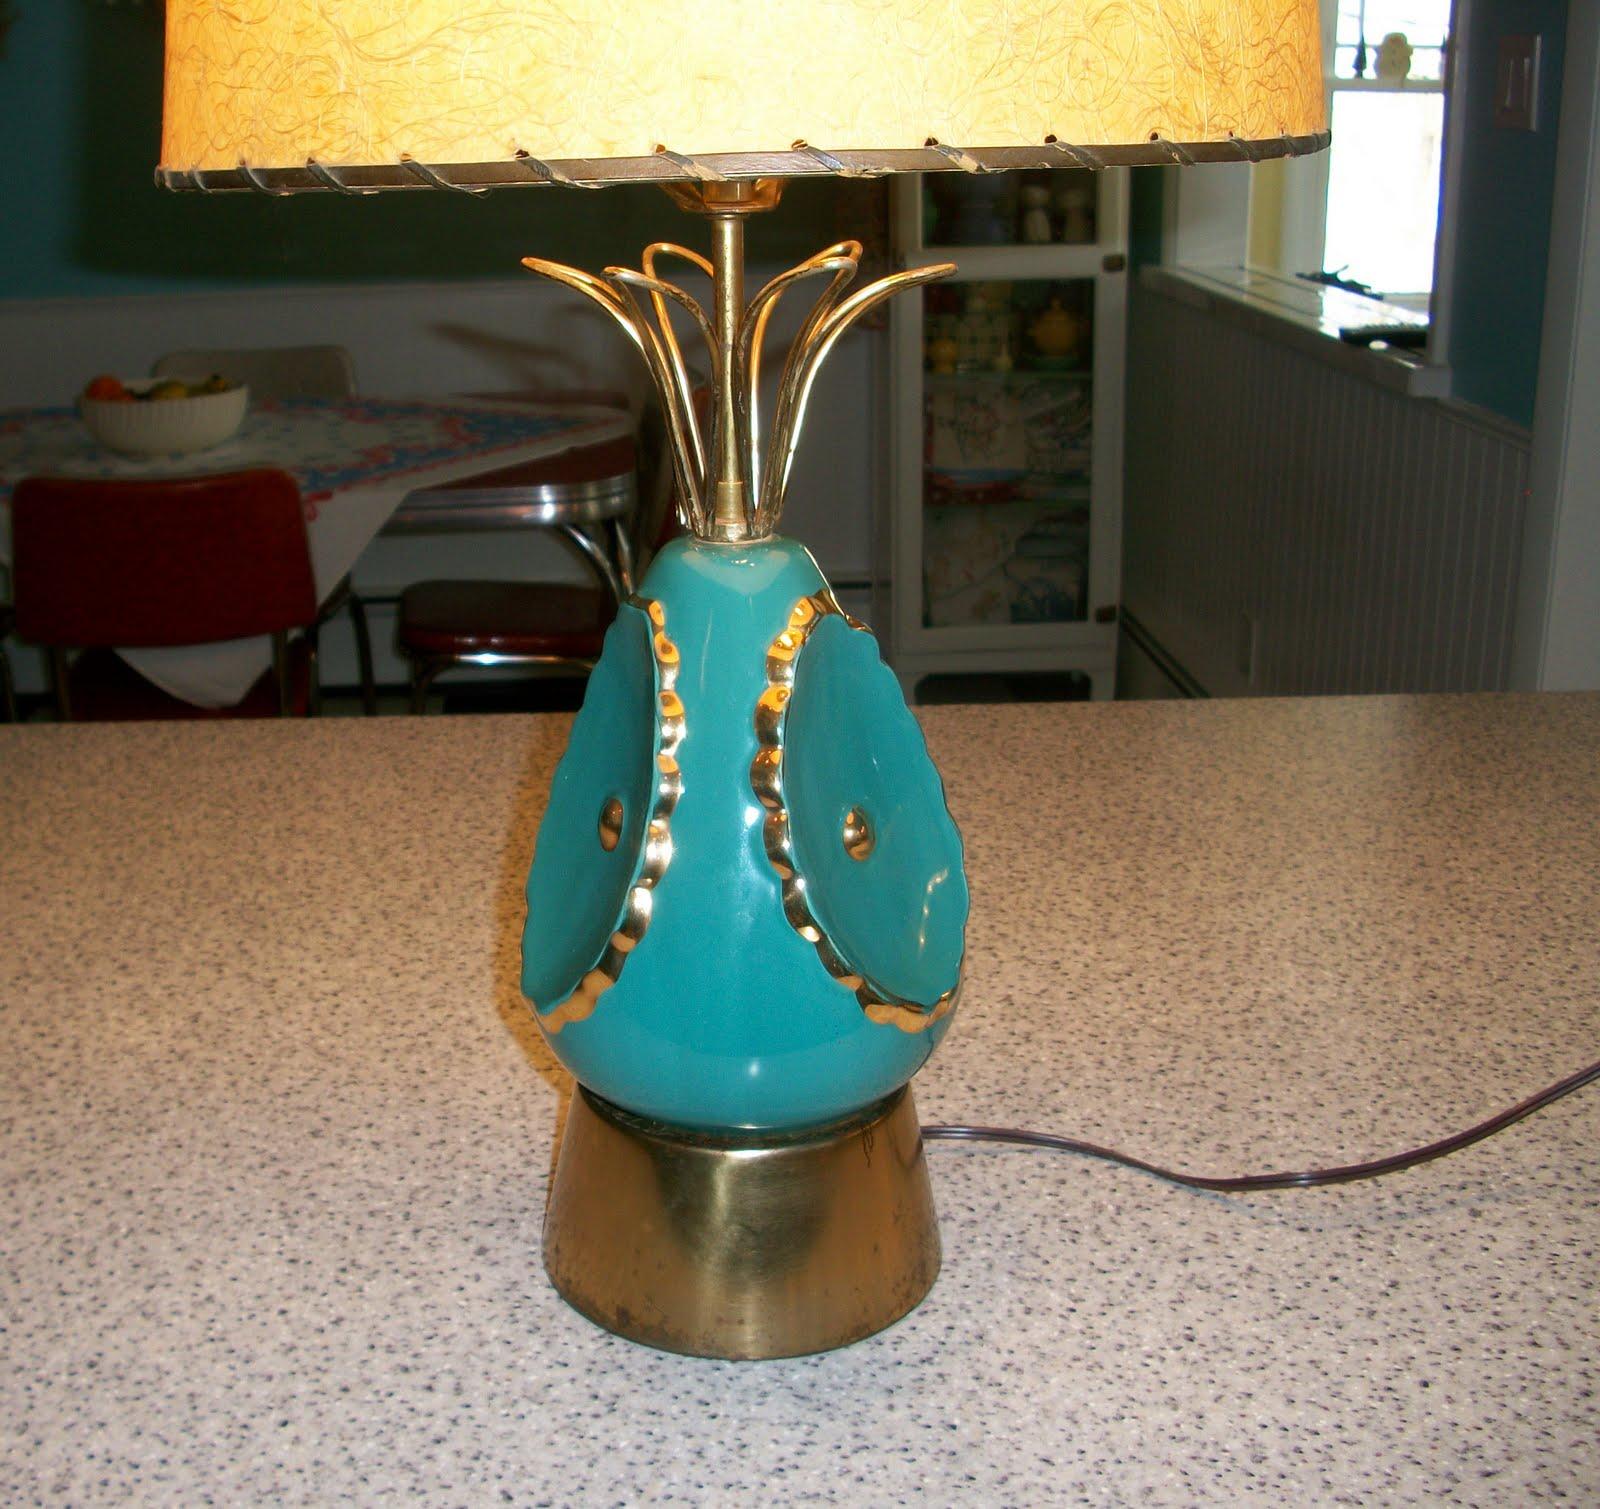 Kitschy Vintage: Retro Ceramic 'Pineapple' Lamp